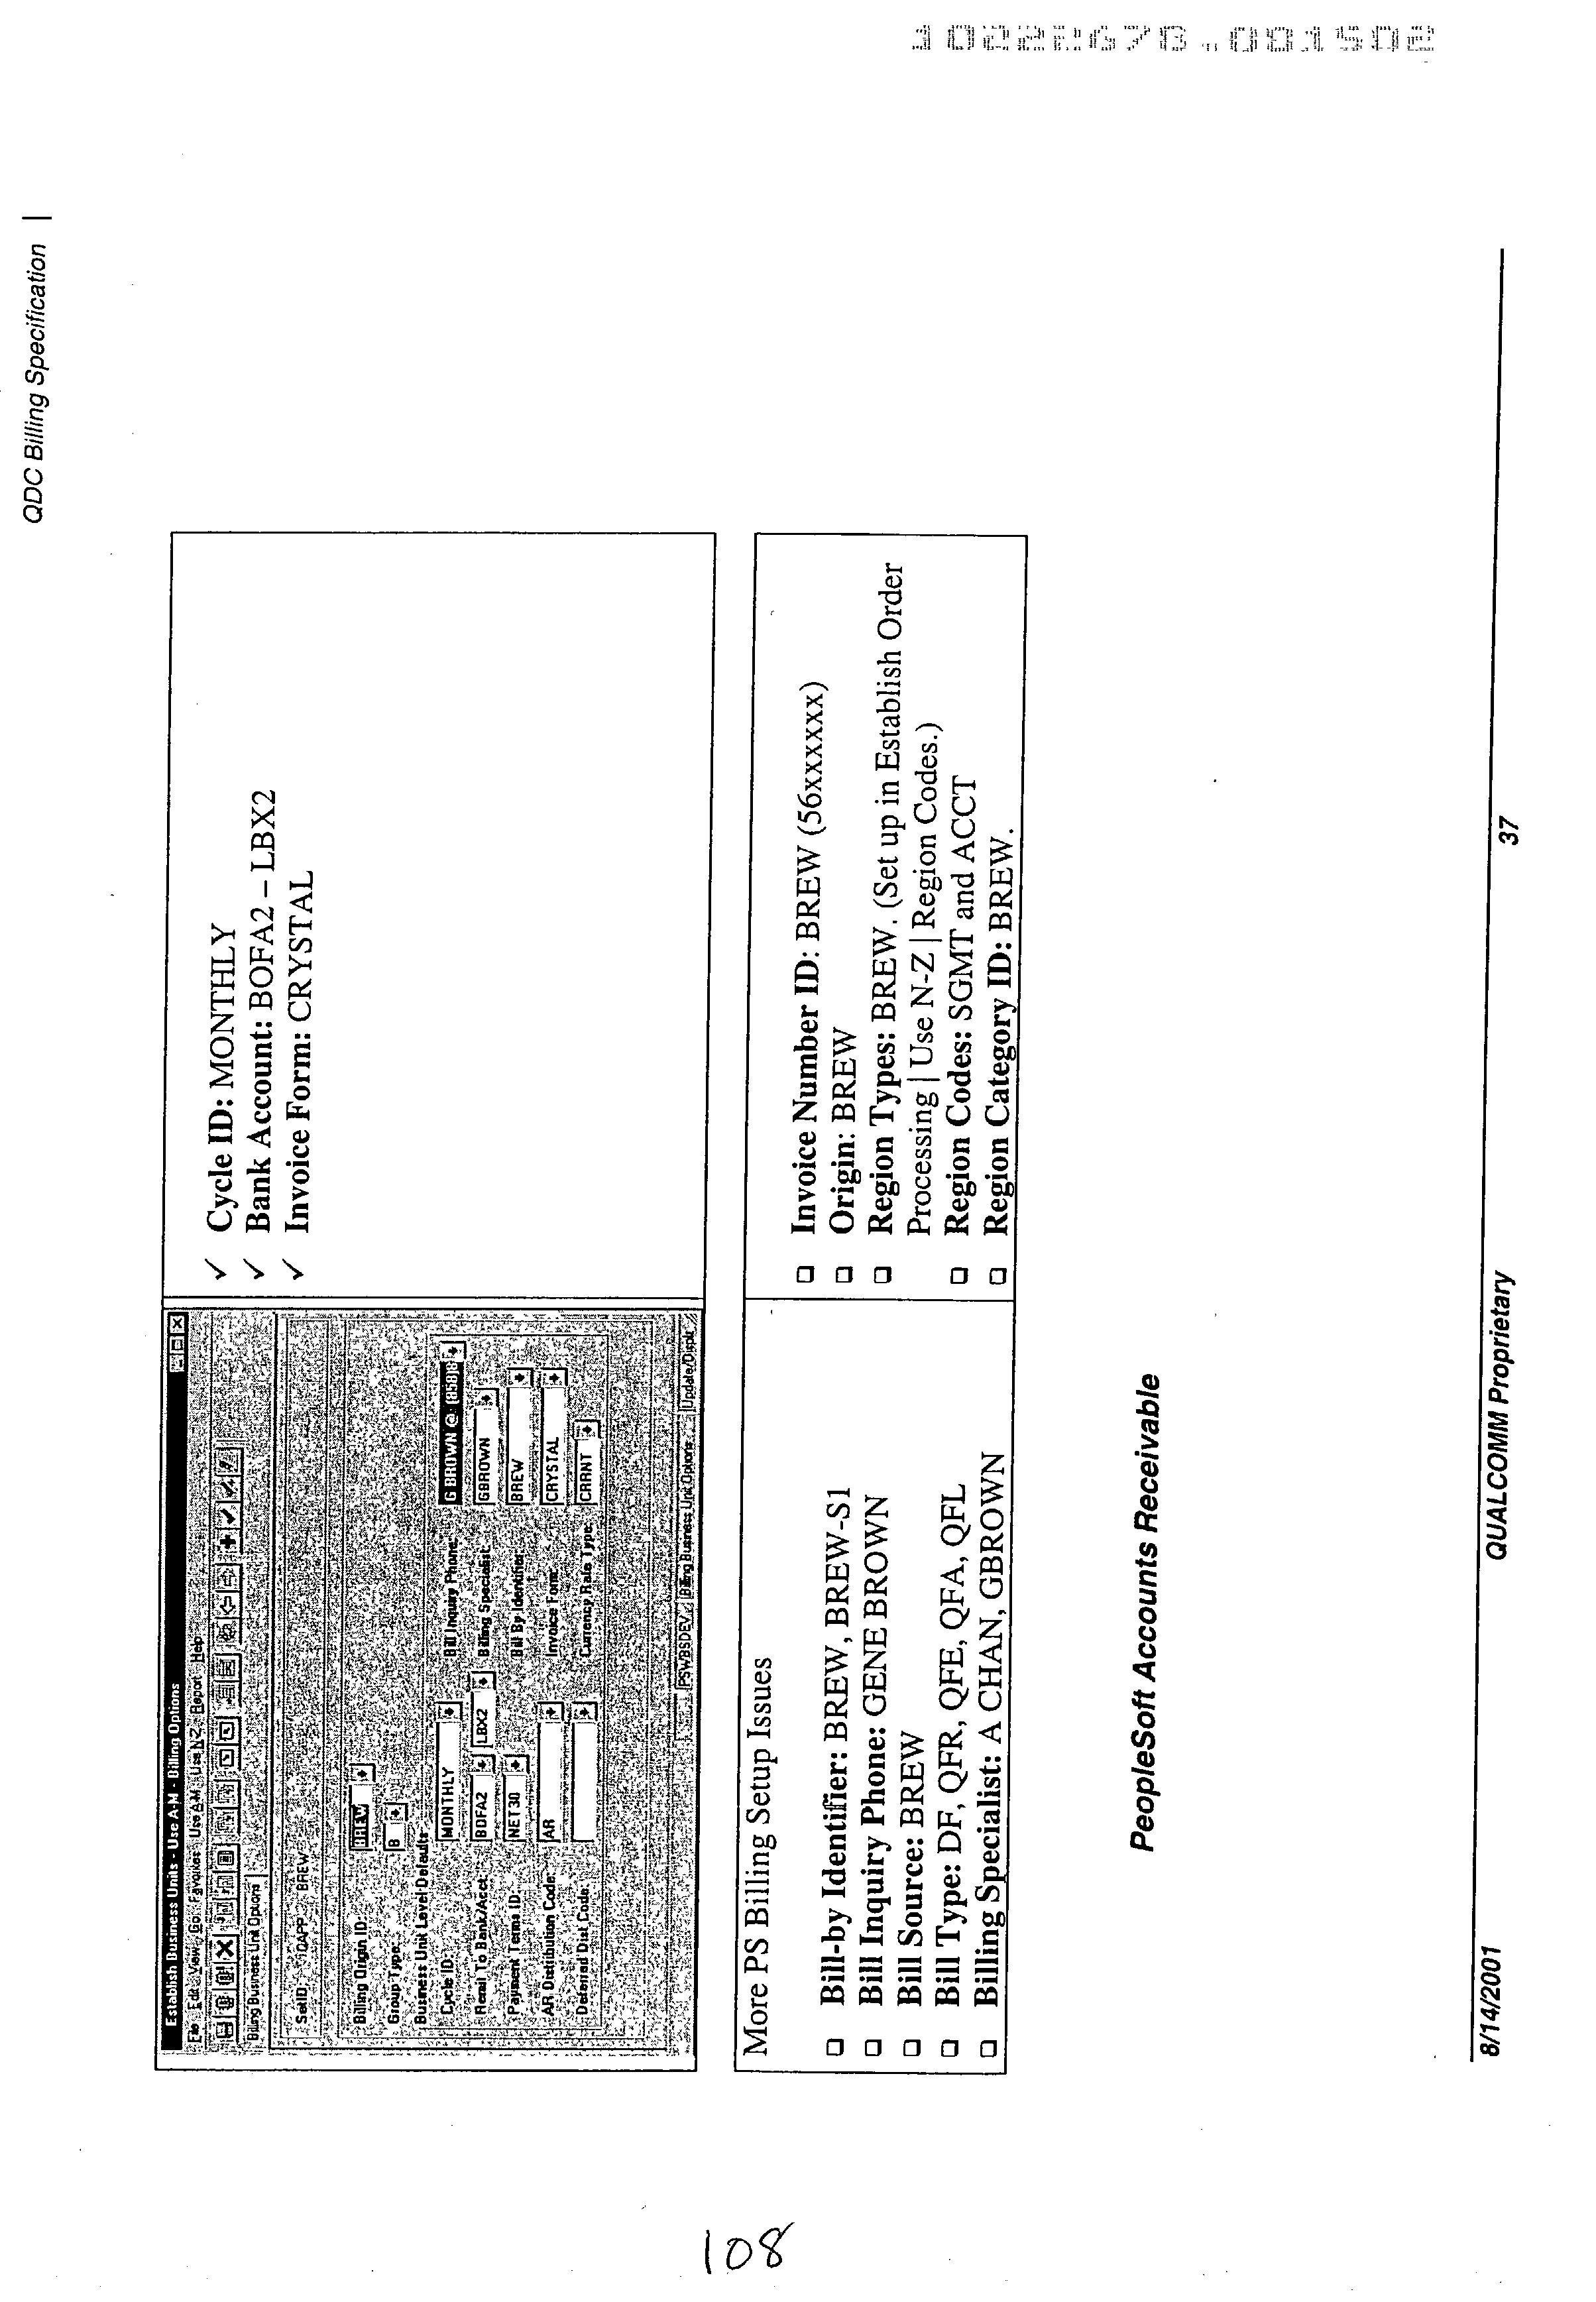 Figure US20030078886A1-20030424-P00104